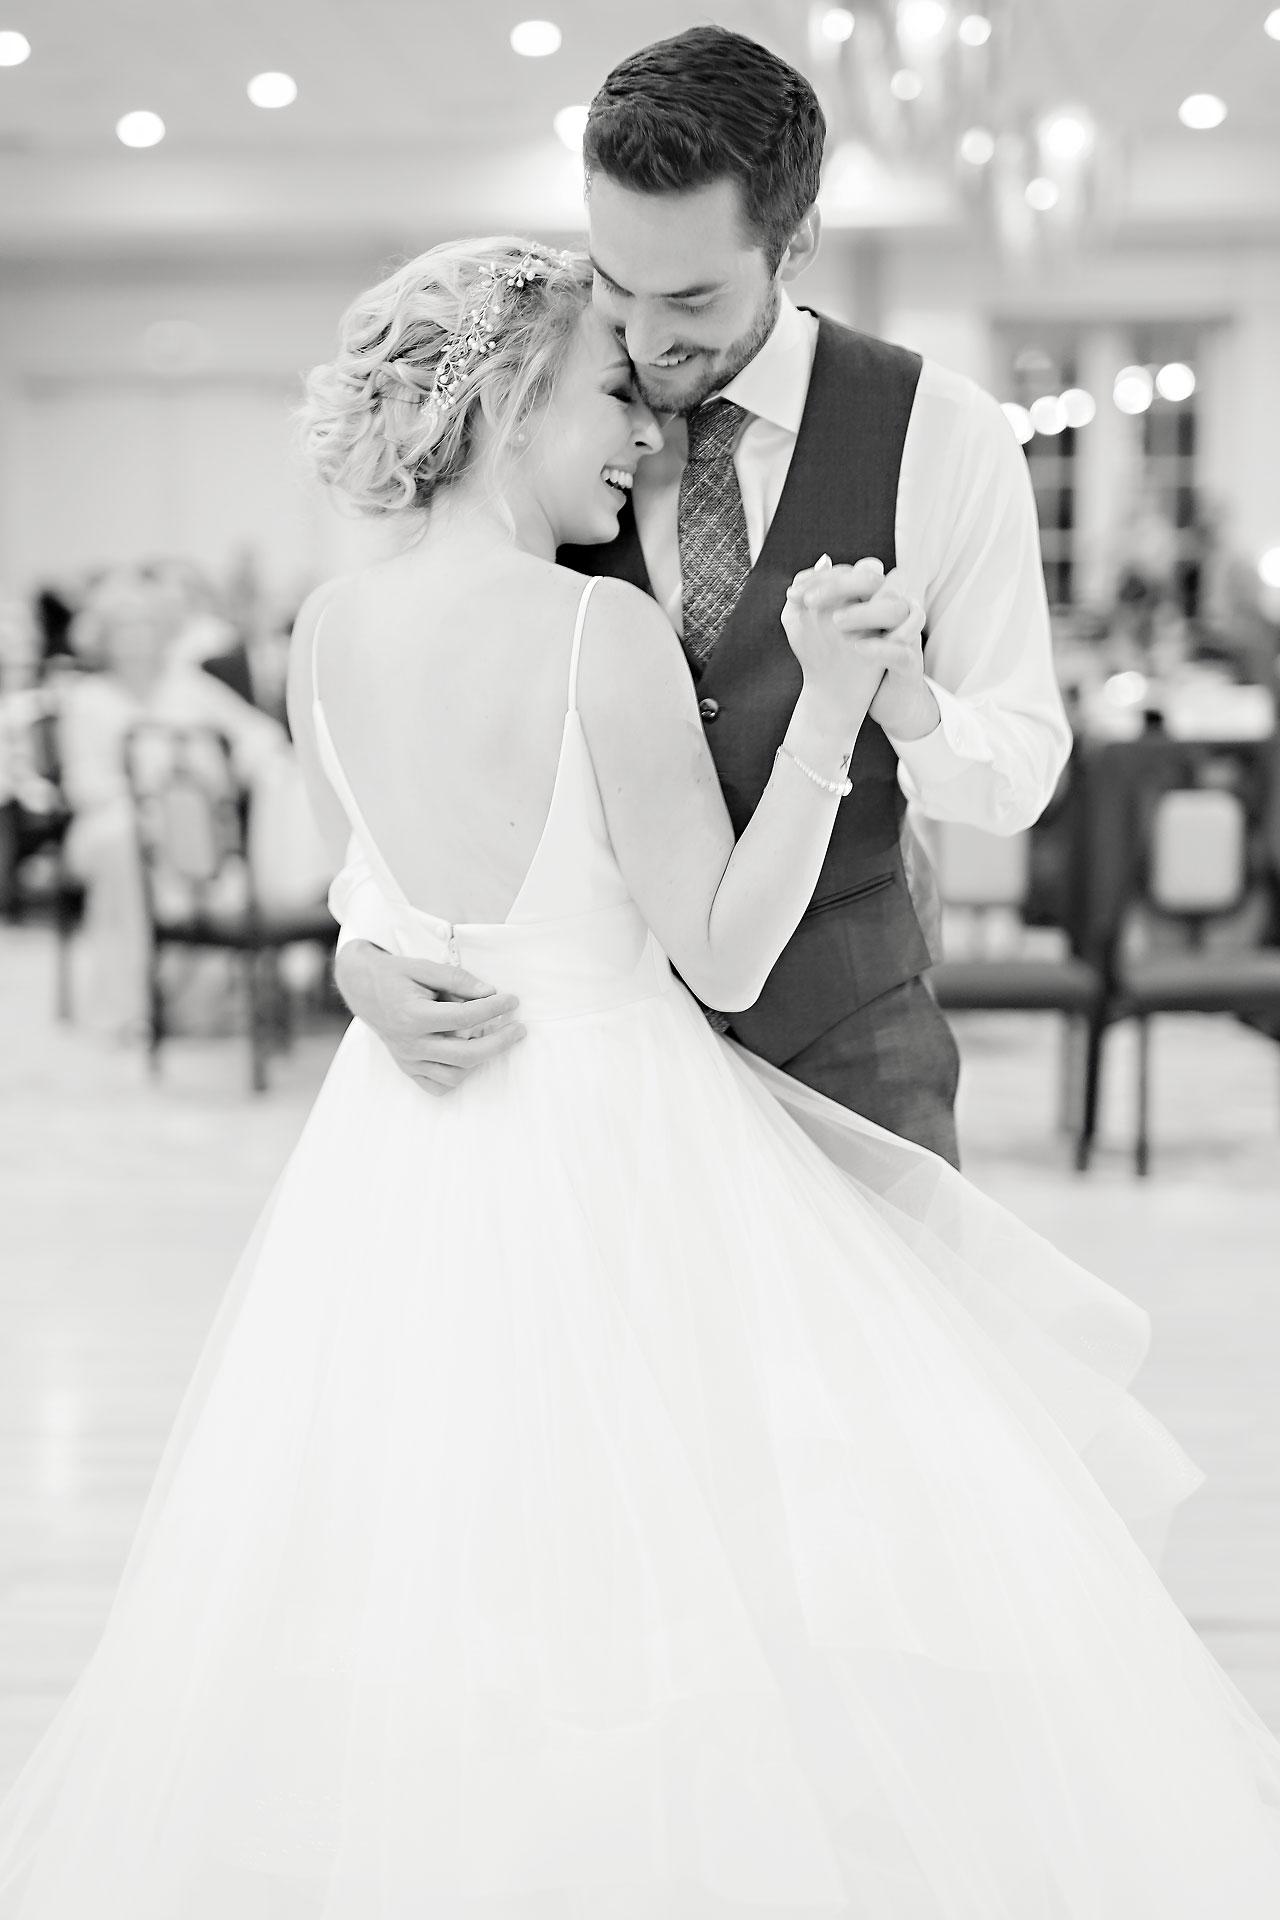 Brylie Jackson Ritz Charles Carmel Indiana Wedding Reception 160